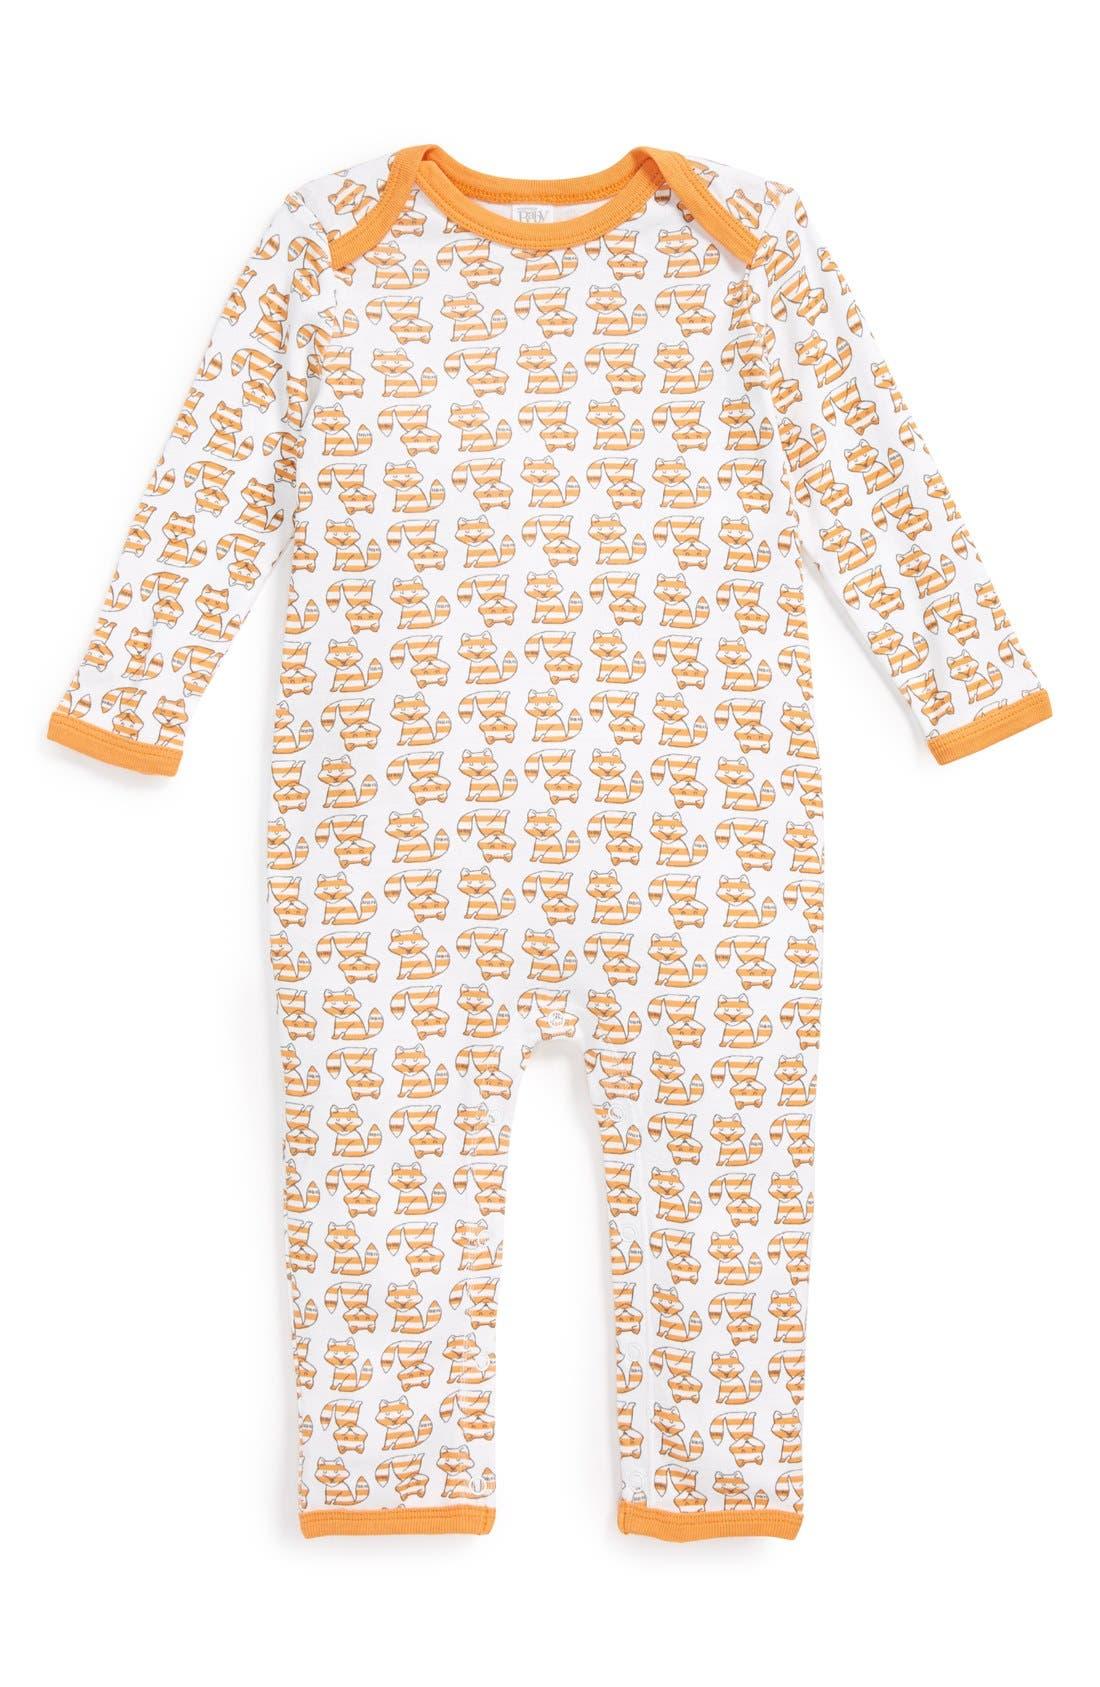 Main Image - Nordstrom Baby Print Romper (Baby Boys)